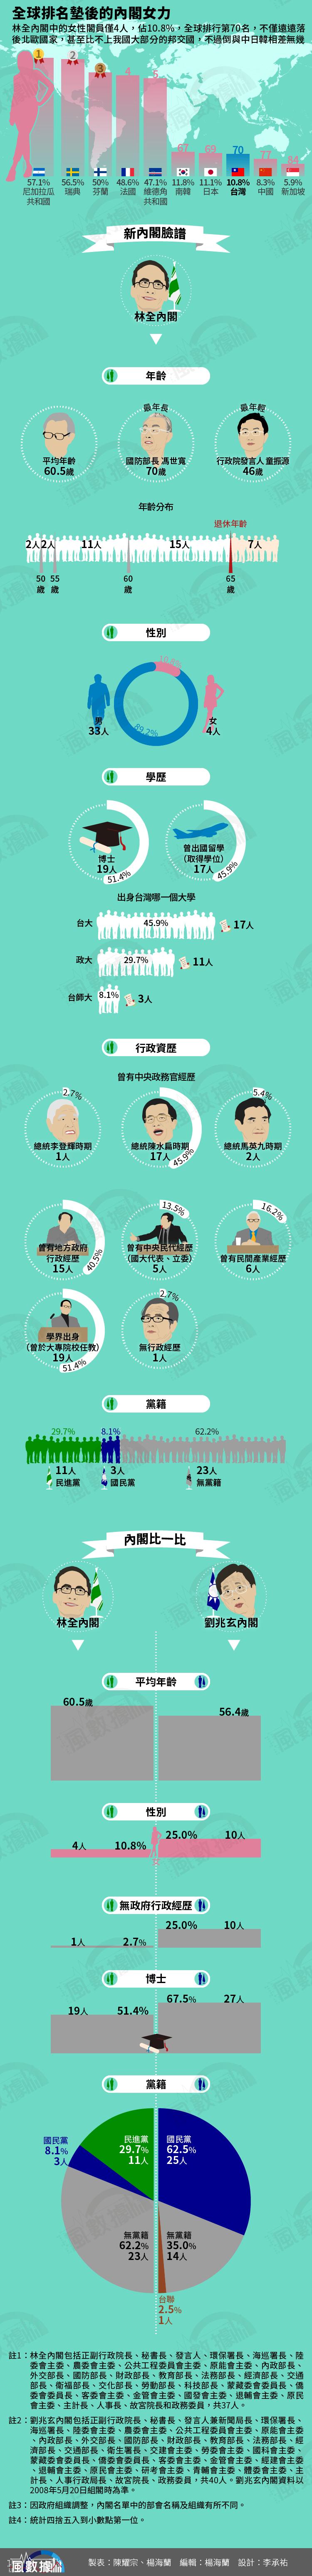 20160516-SMG0034-S01nA-風數據/解構林全內閣,全球排名墊後的內閣女力,全圖-01